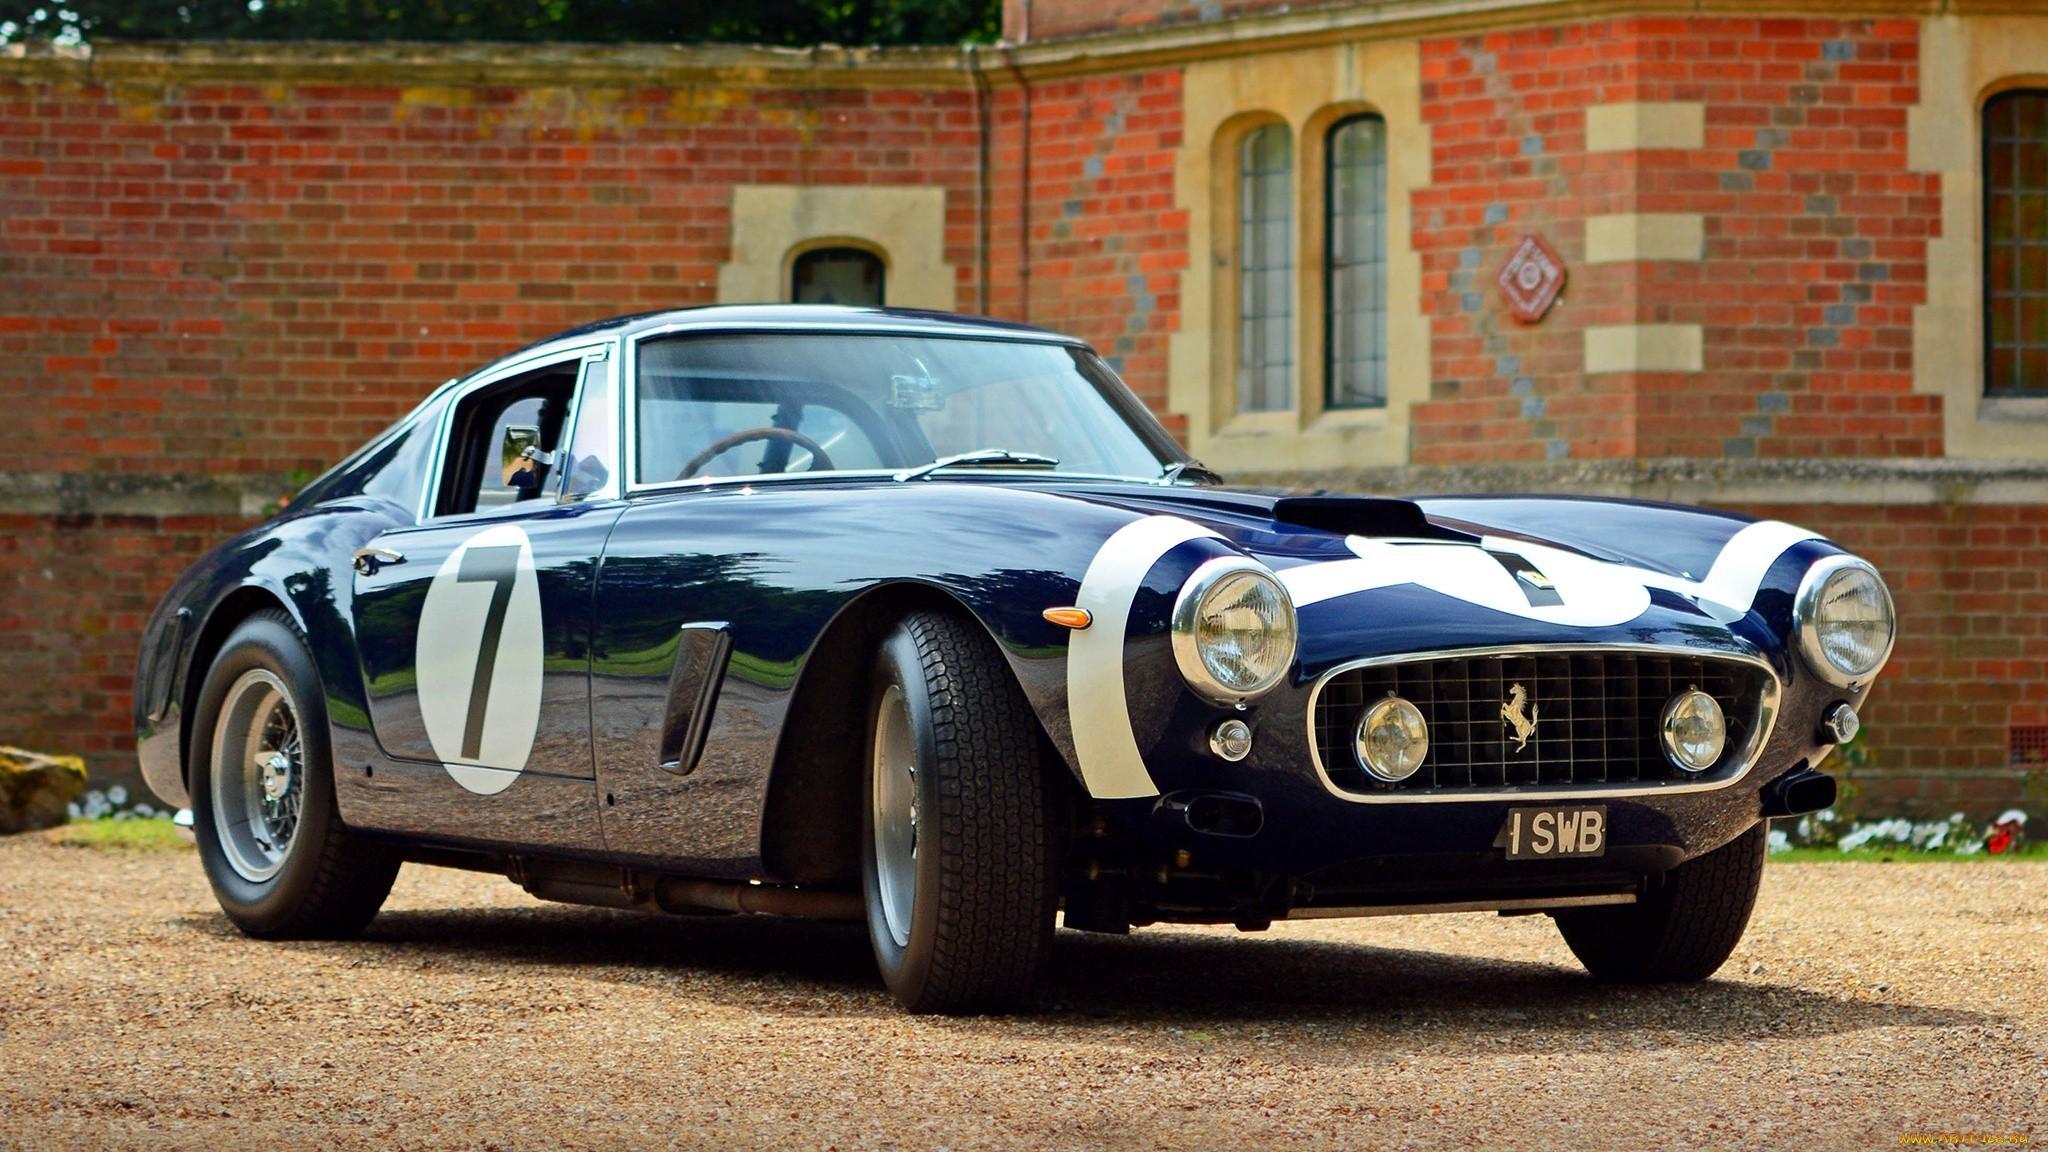 Wallpaper  old car, sports car, classic car, Convertible